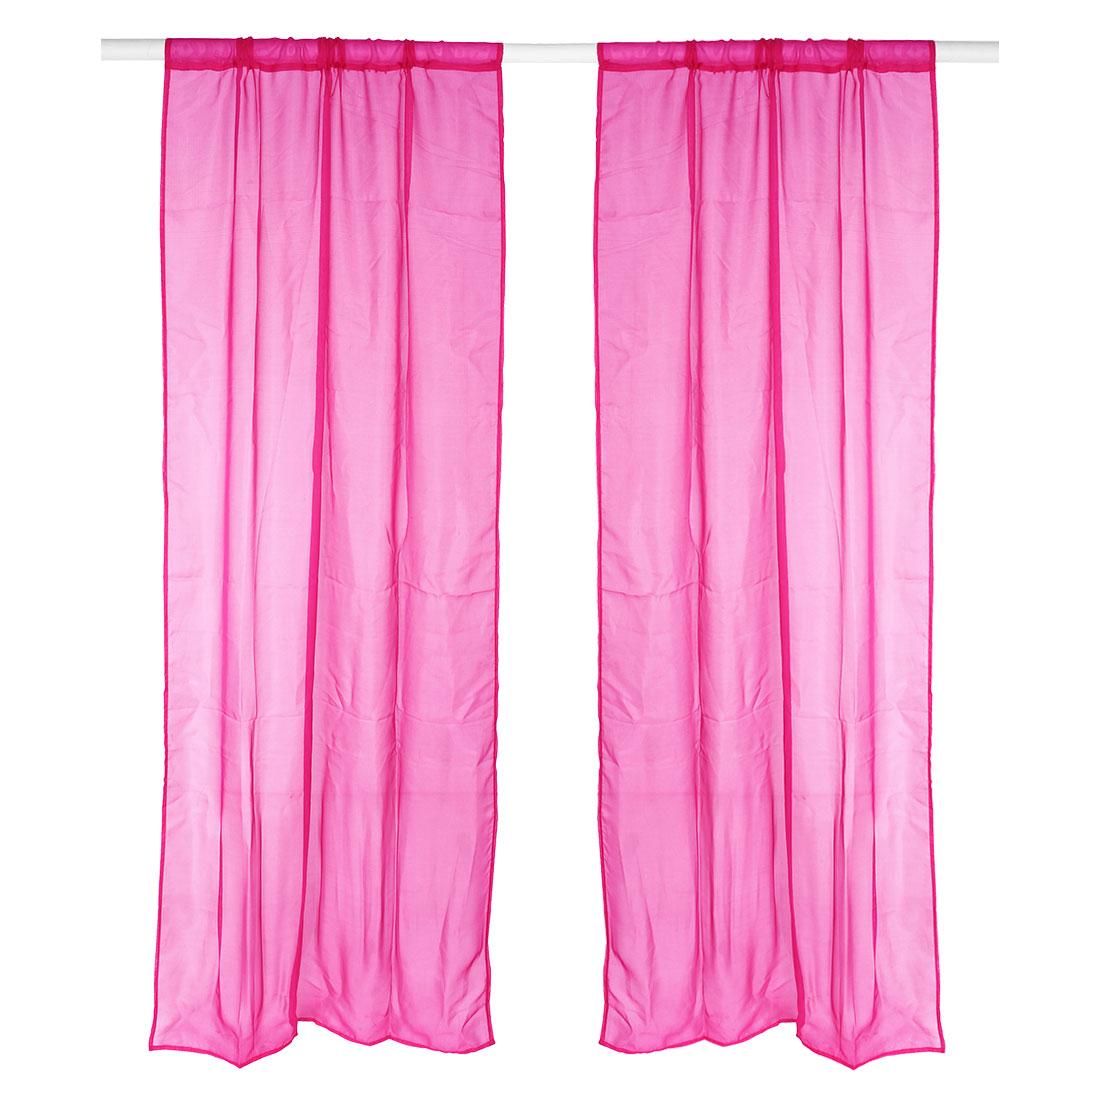 Home Bedroom Decorative Voile Panel Window Sheer Curtain Fuchsia 100 x 200cm